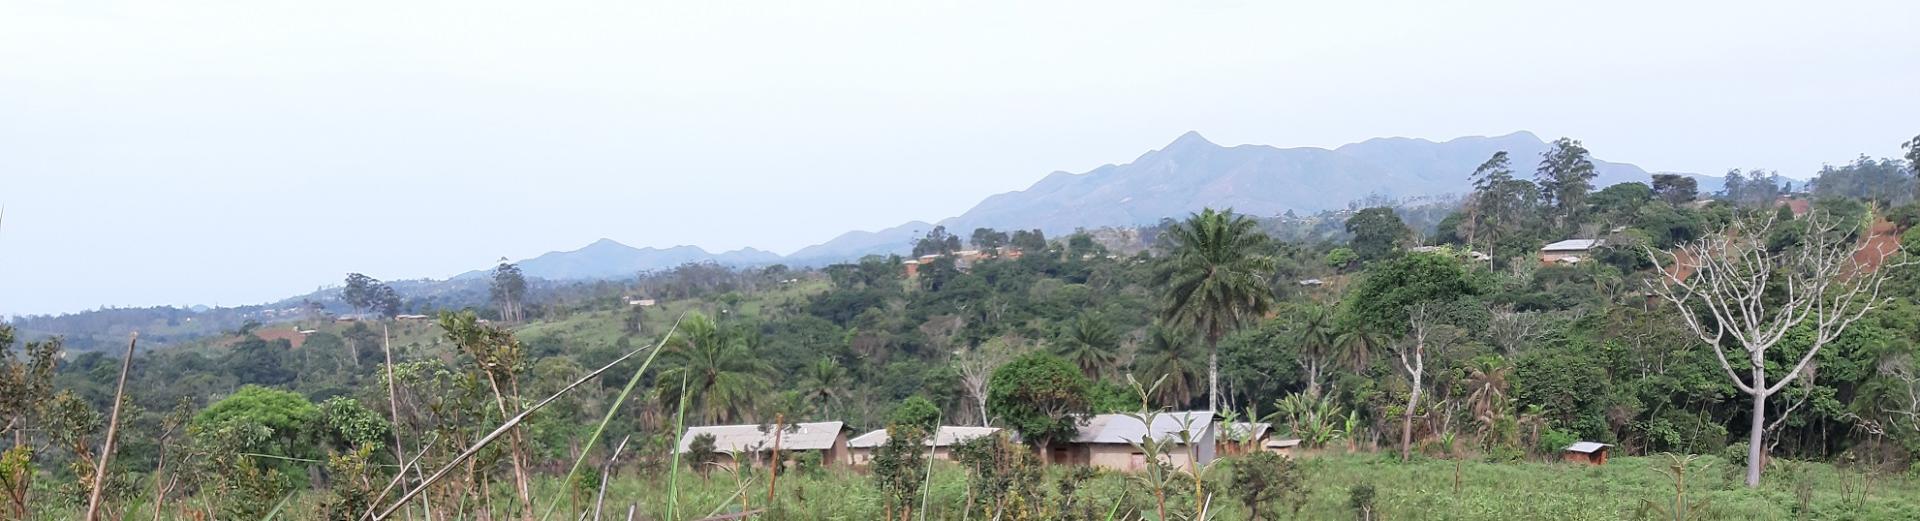 Bamena vue monts batchingou